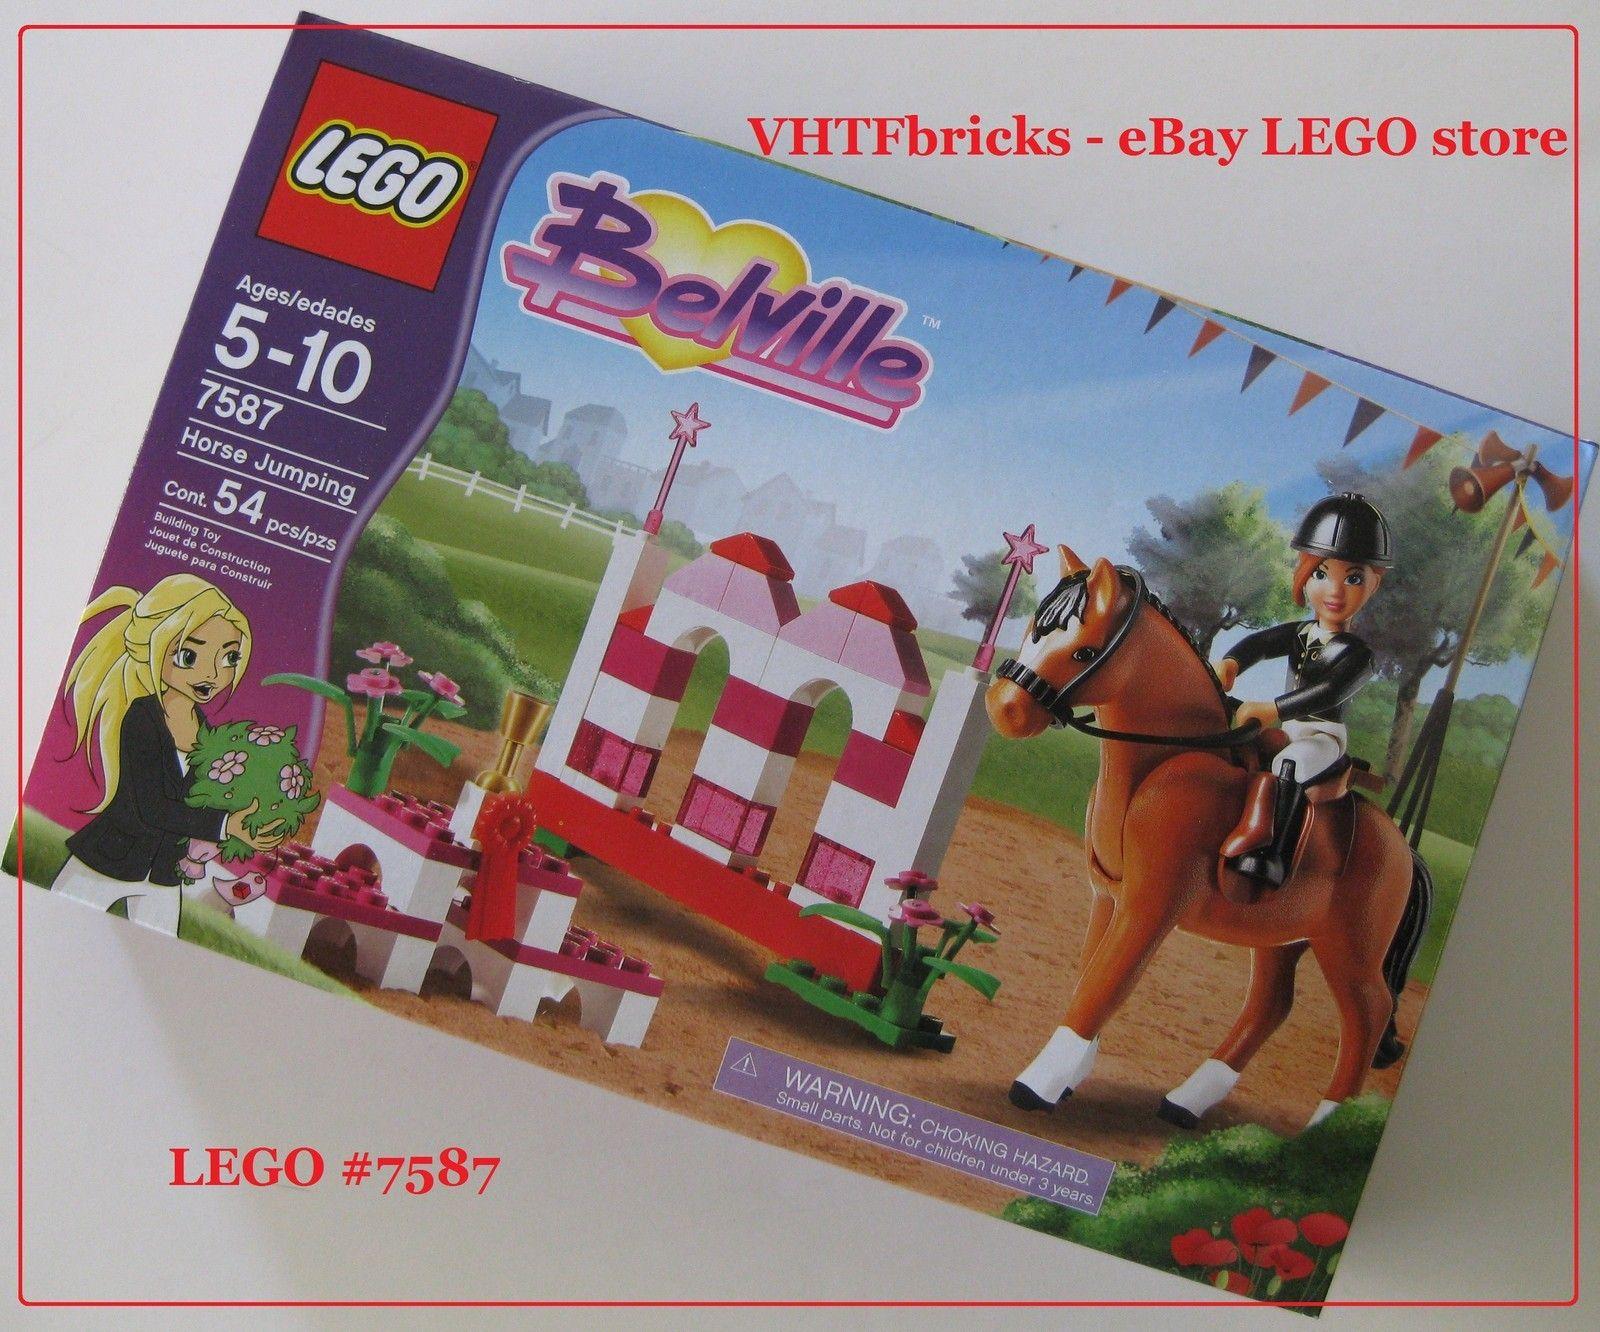 lego belville 7587 horse jumping set for girls friends sealed new vhtf item 2895